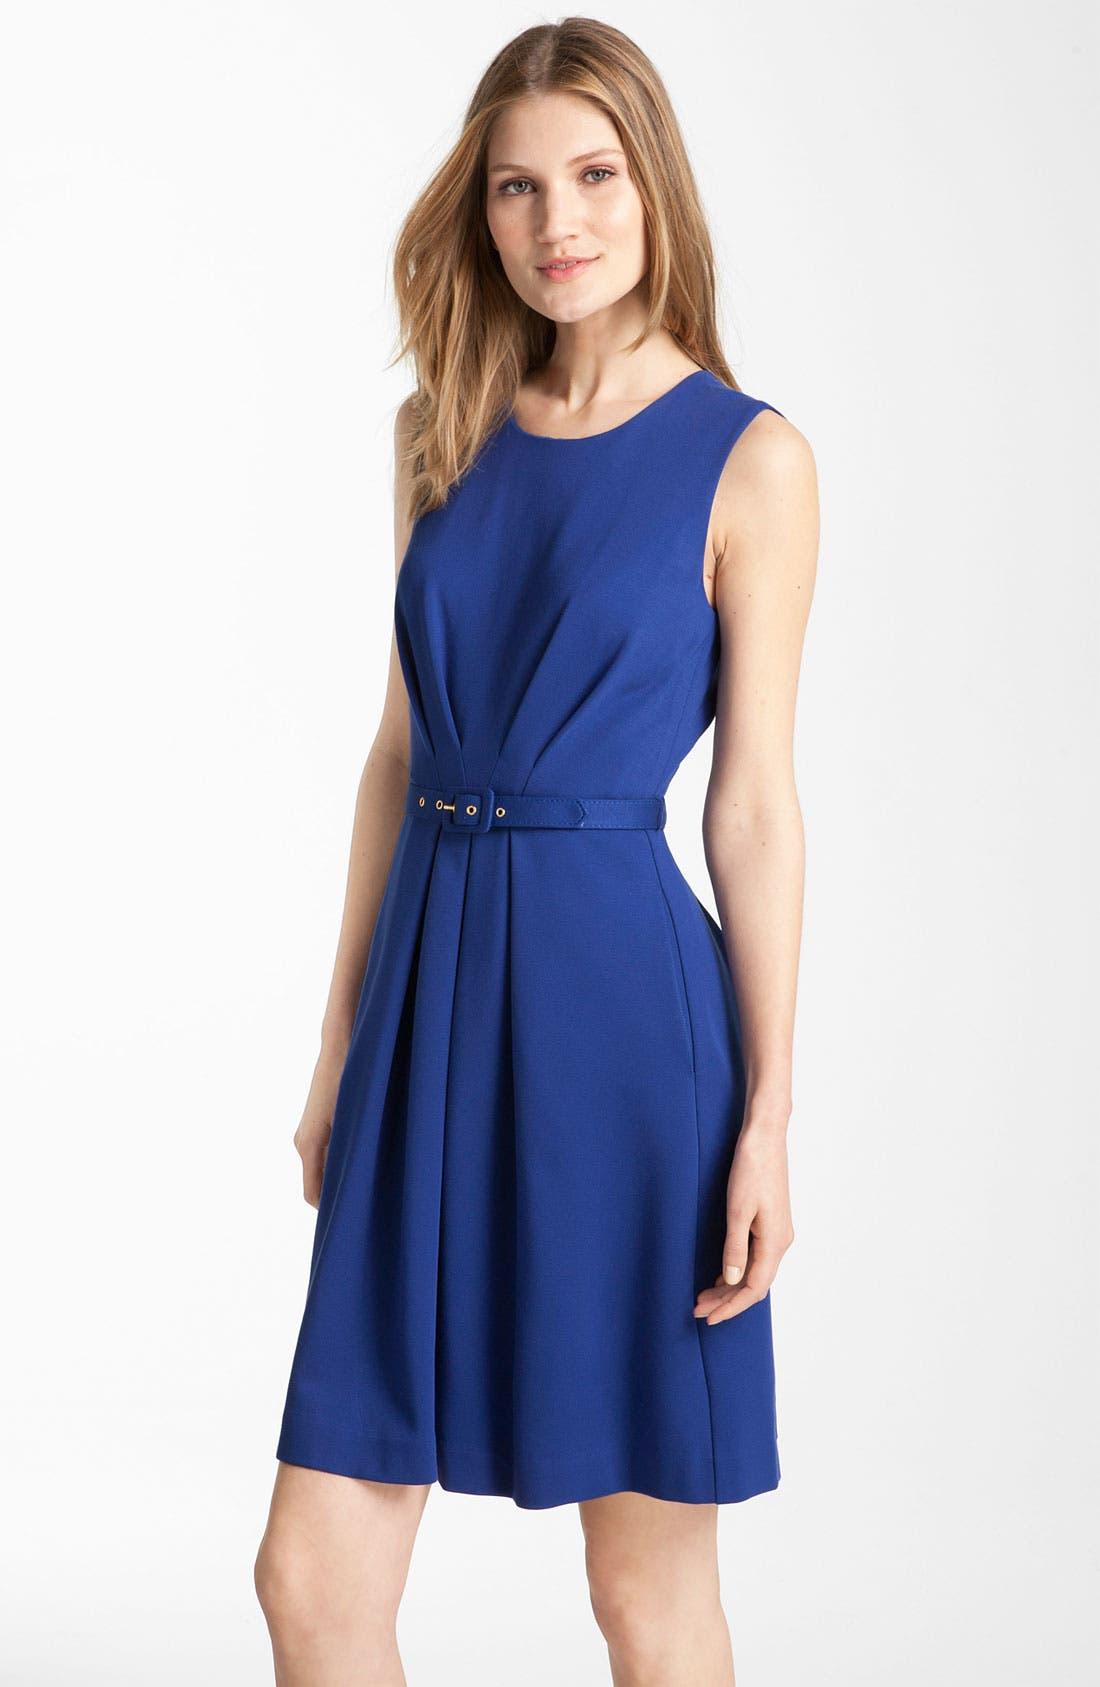 Main Image - Trina Turk 'Princess' Ponte Knit Dress (Online Exclusive)